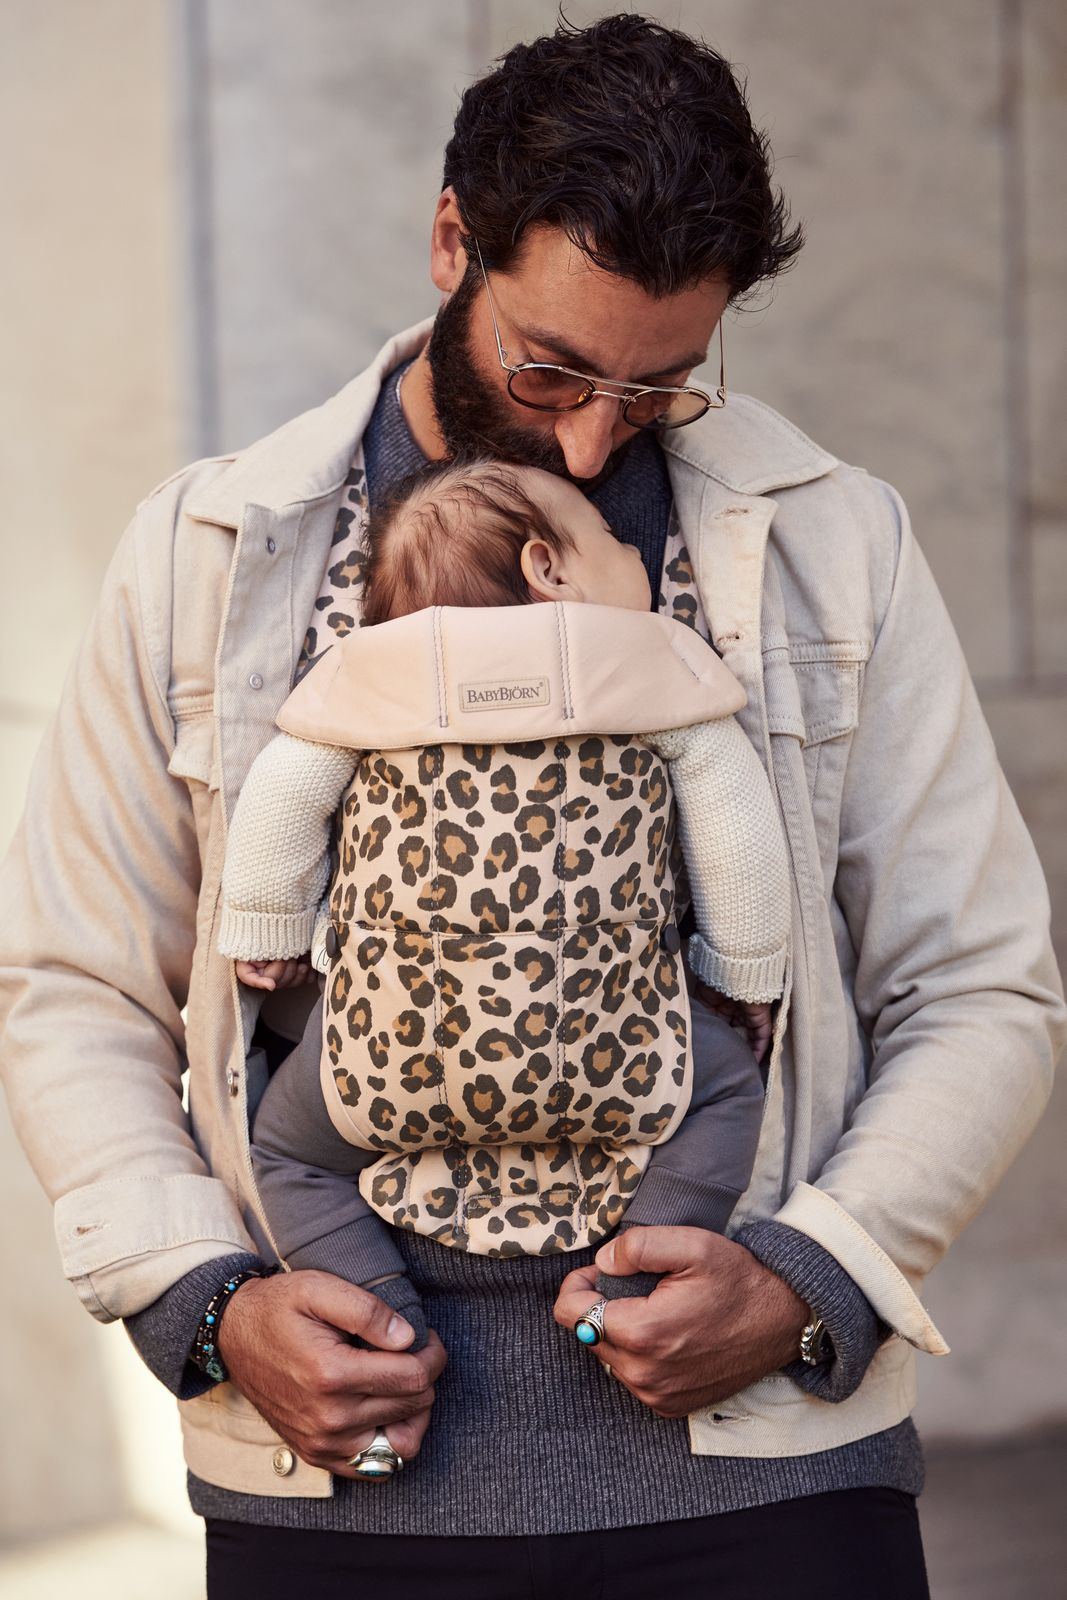 Vyrp11 366021075 Baby Carrier Mini Leo Cotton Lifestyle Babybjorn 7 Medium